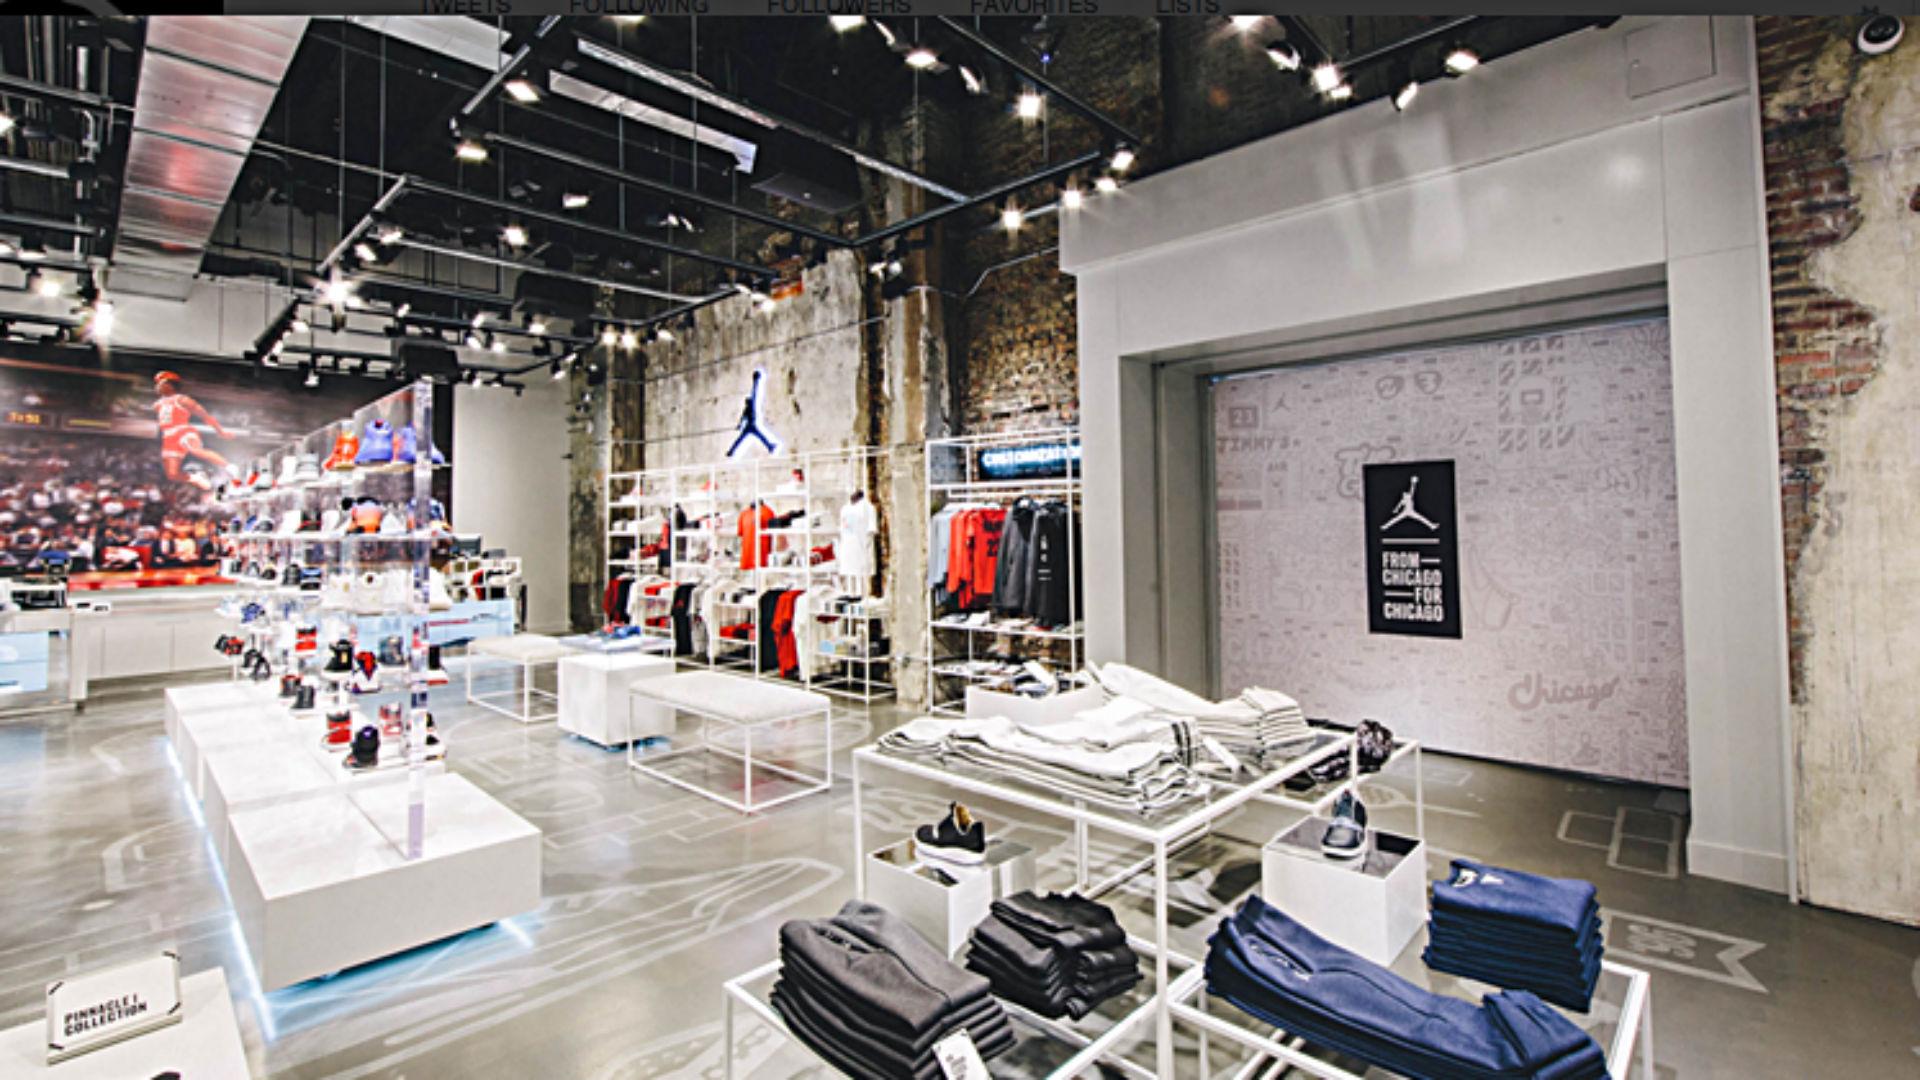 New Jordan Brand store opens in Chicago